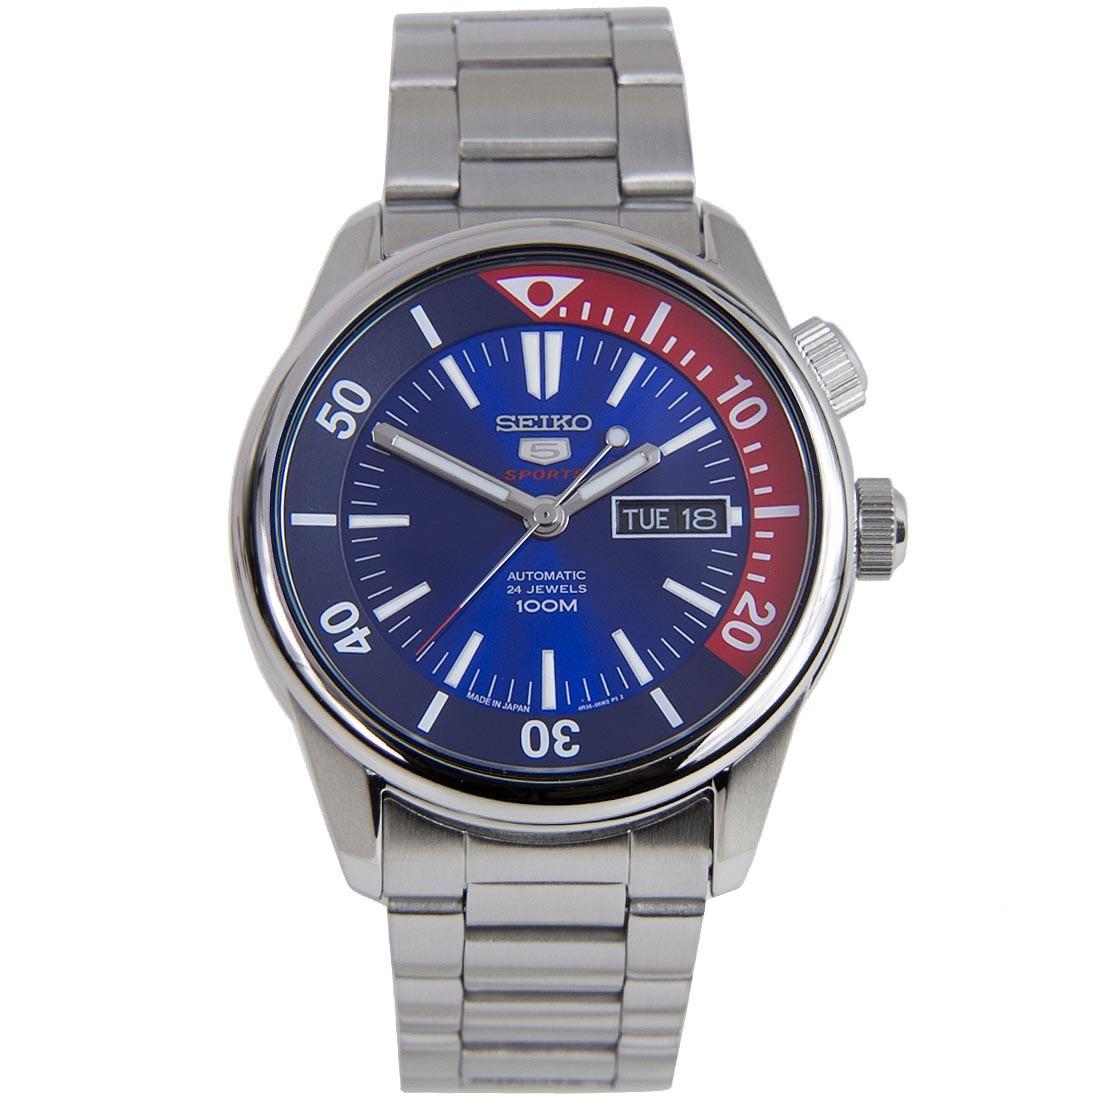 Часы Seiko 5 Sports SRPB25K1 Automatic 4R36